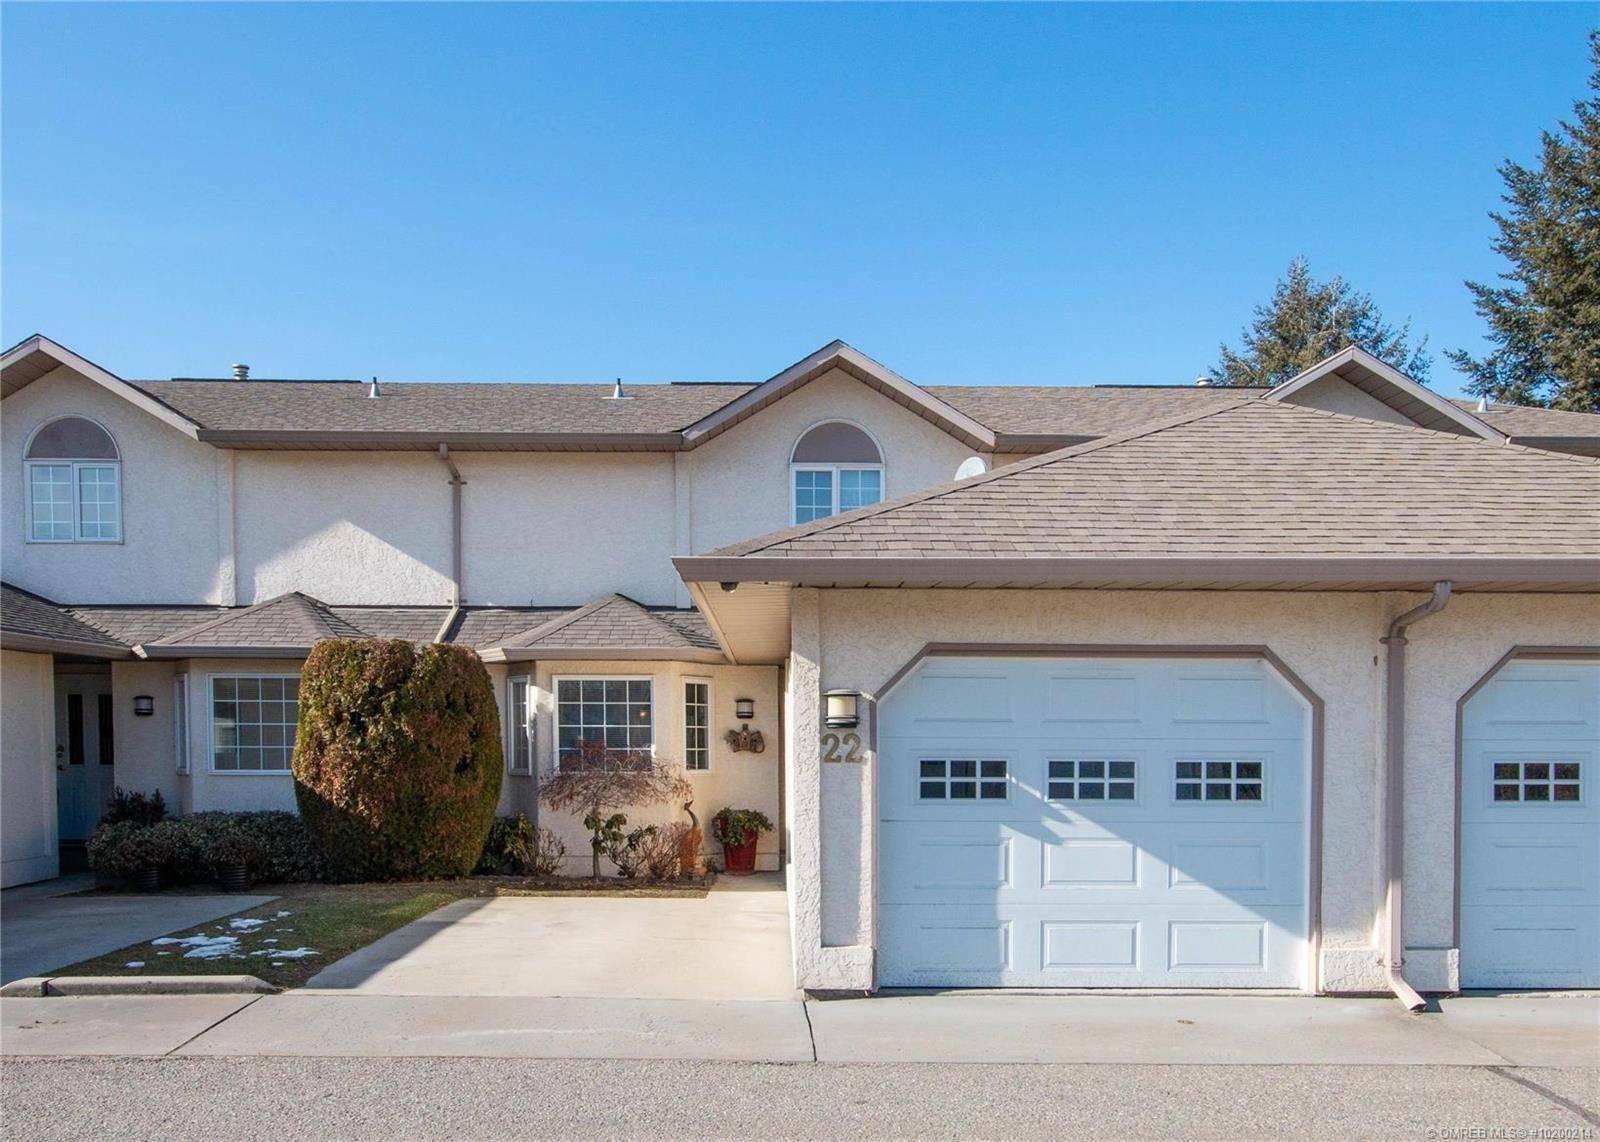 Townhouse for sale at 140 Nickel Rd Unit 22 Kelowna British Columbia - MLS: 10200214